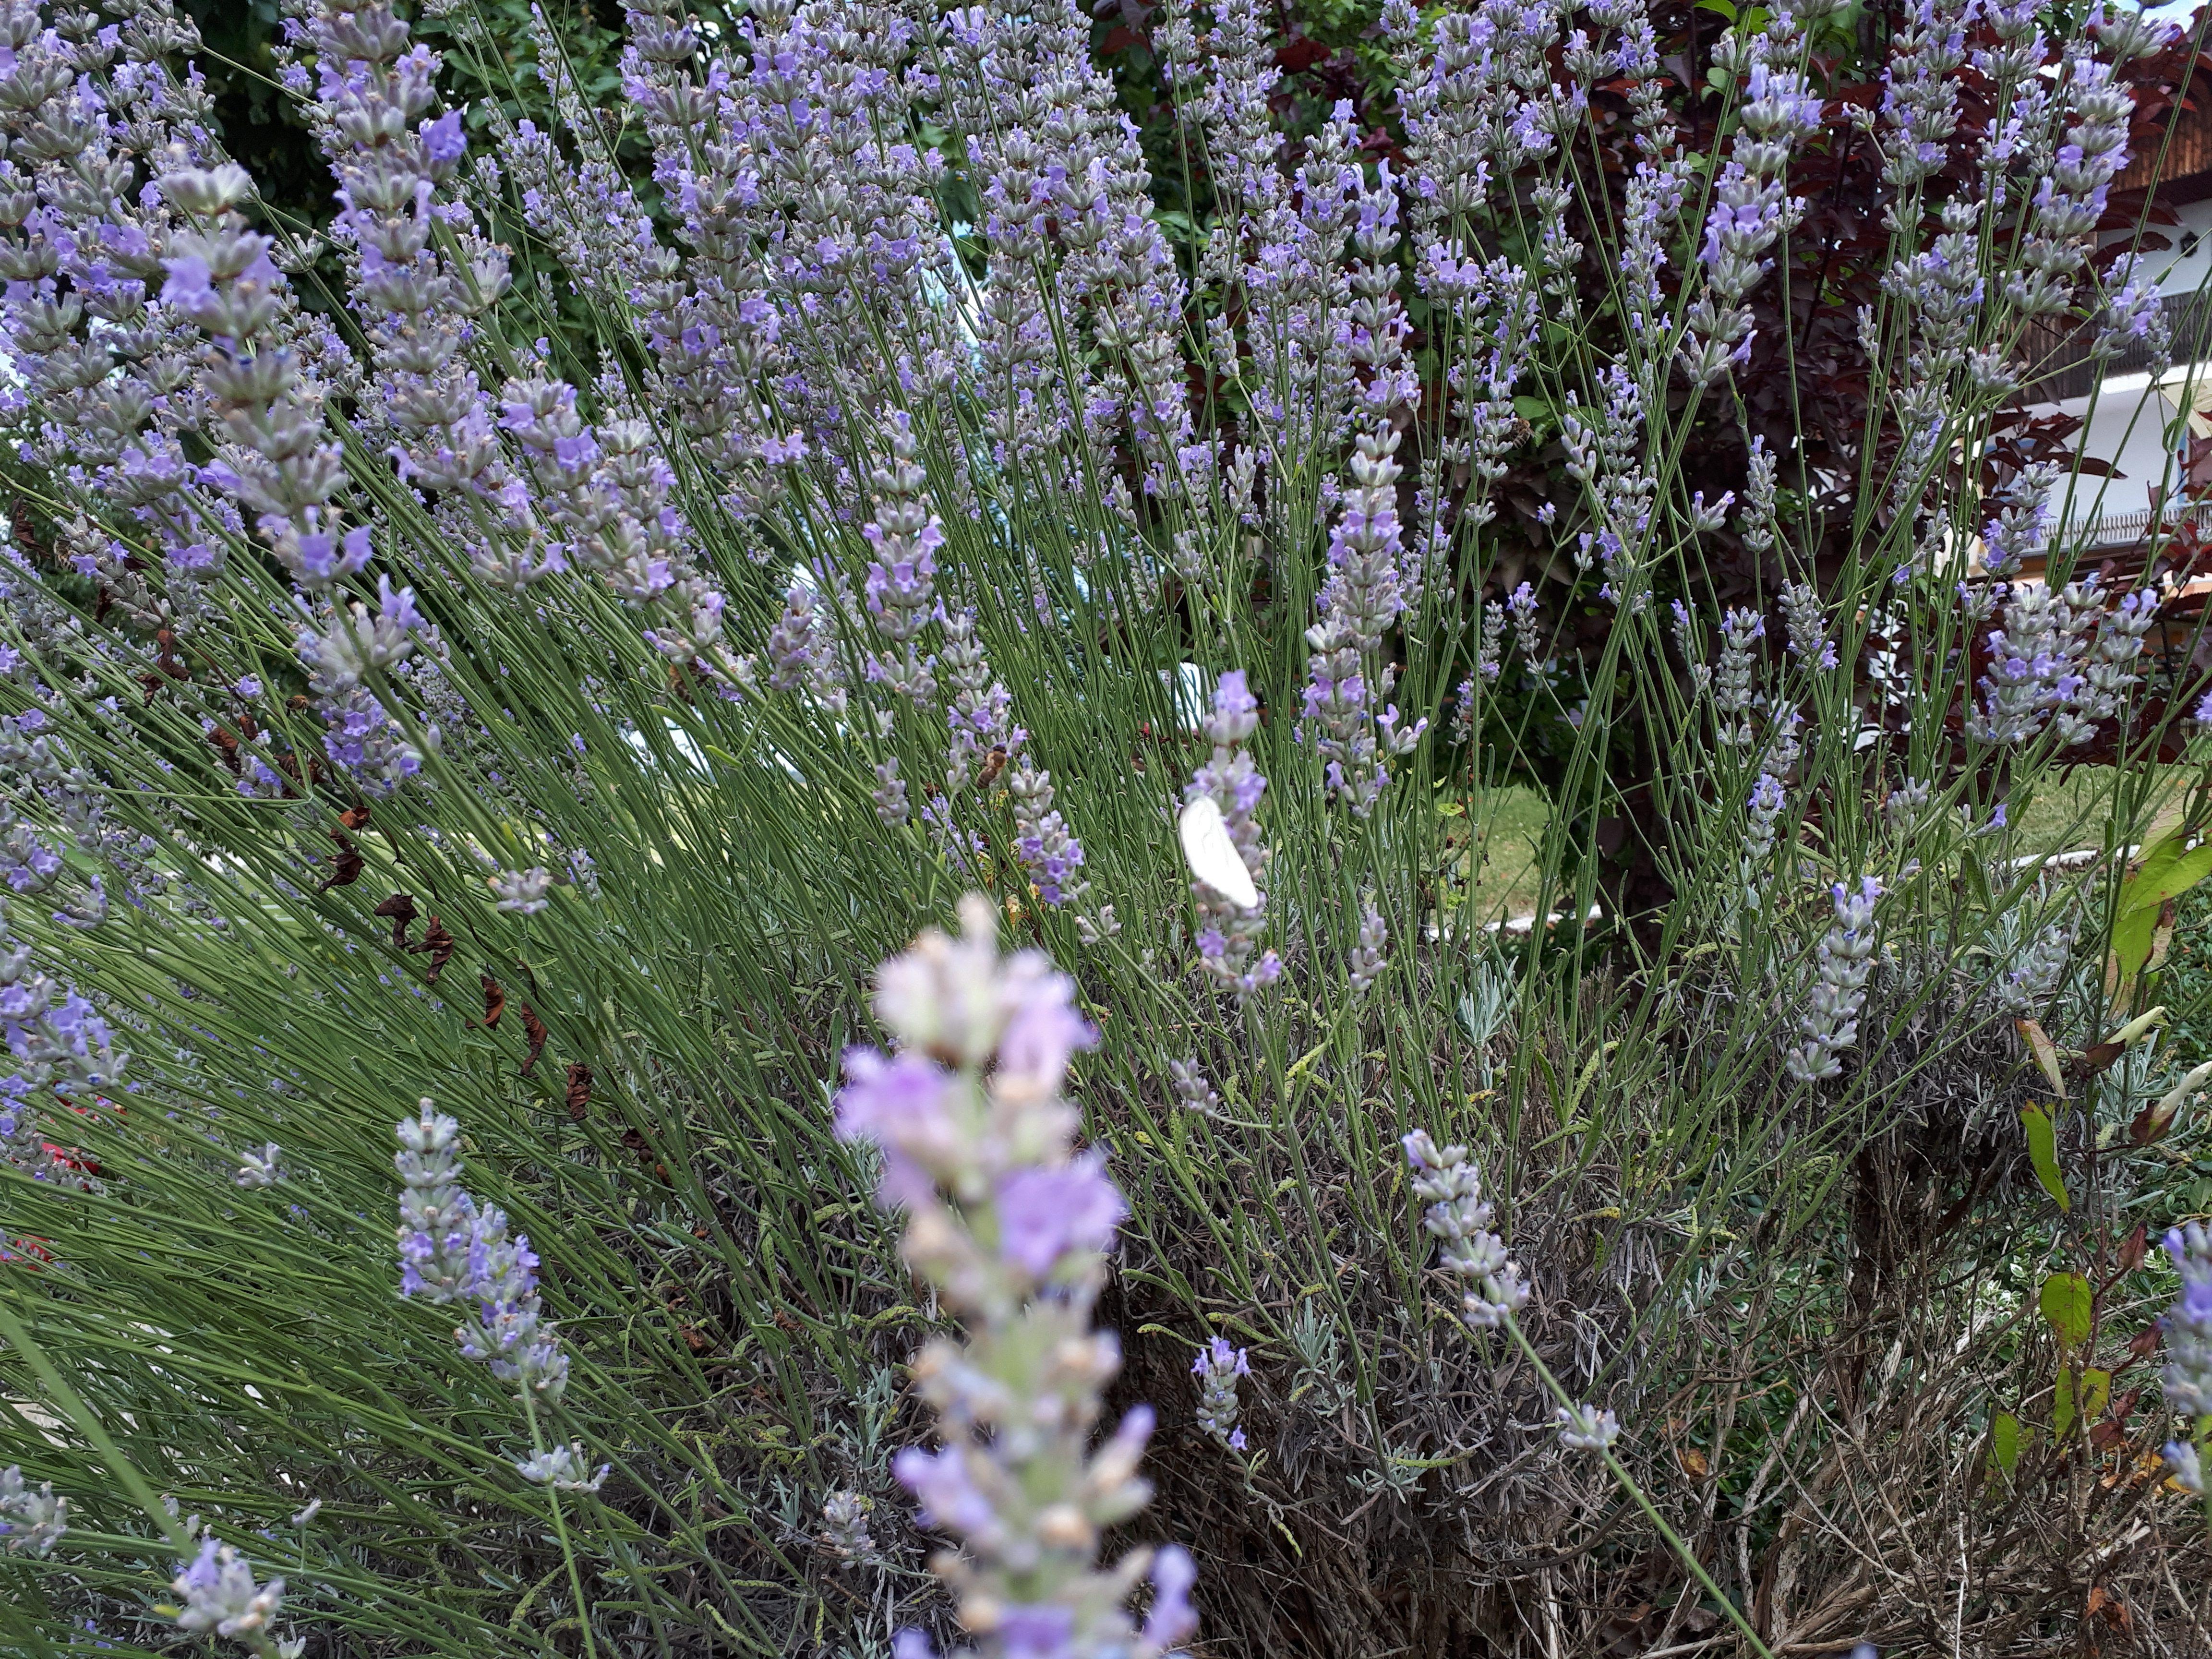 Lavendel in voller Blüte im Biergarten Landgut Kugler Alm